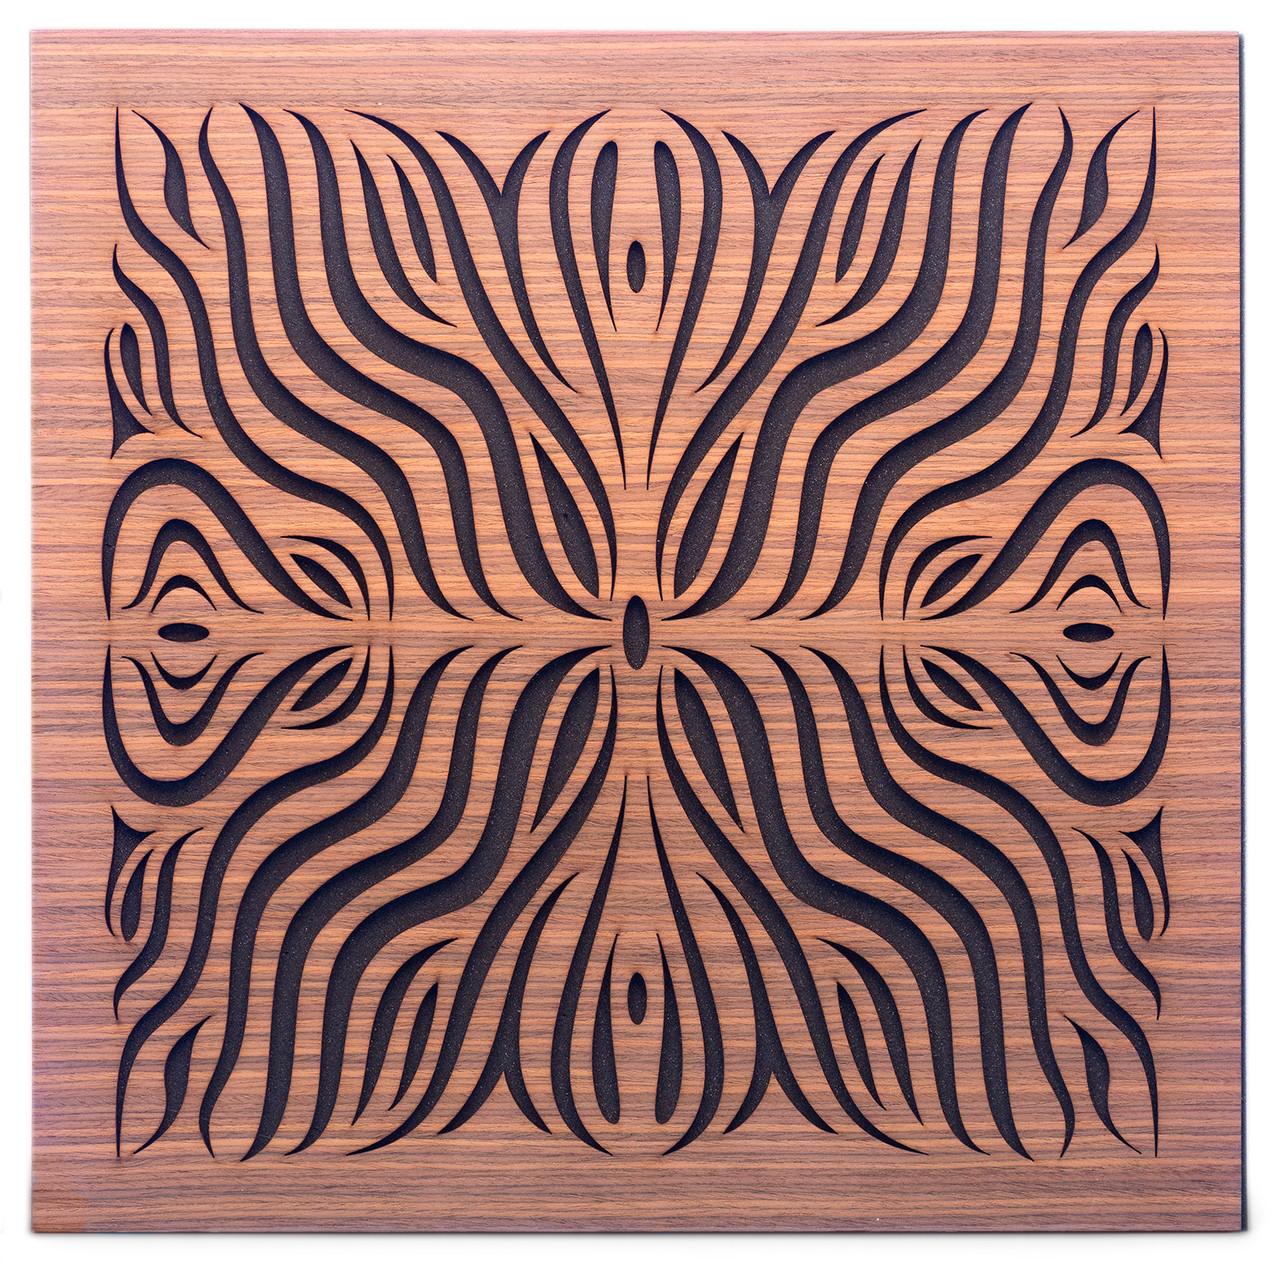 Акустична панель Ecosound Chimera F Rosewood 50х50см 33мм колір коричневий